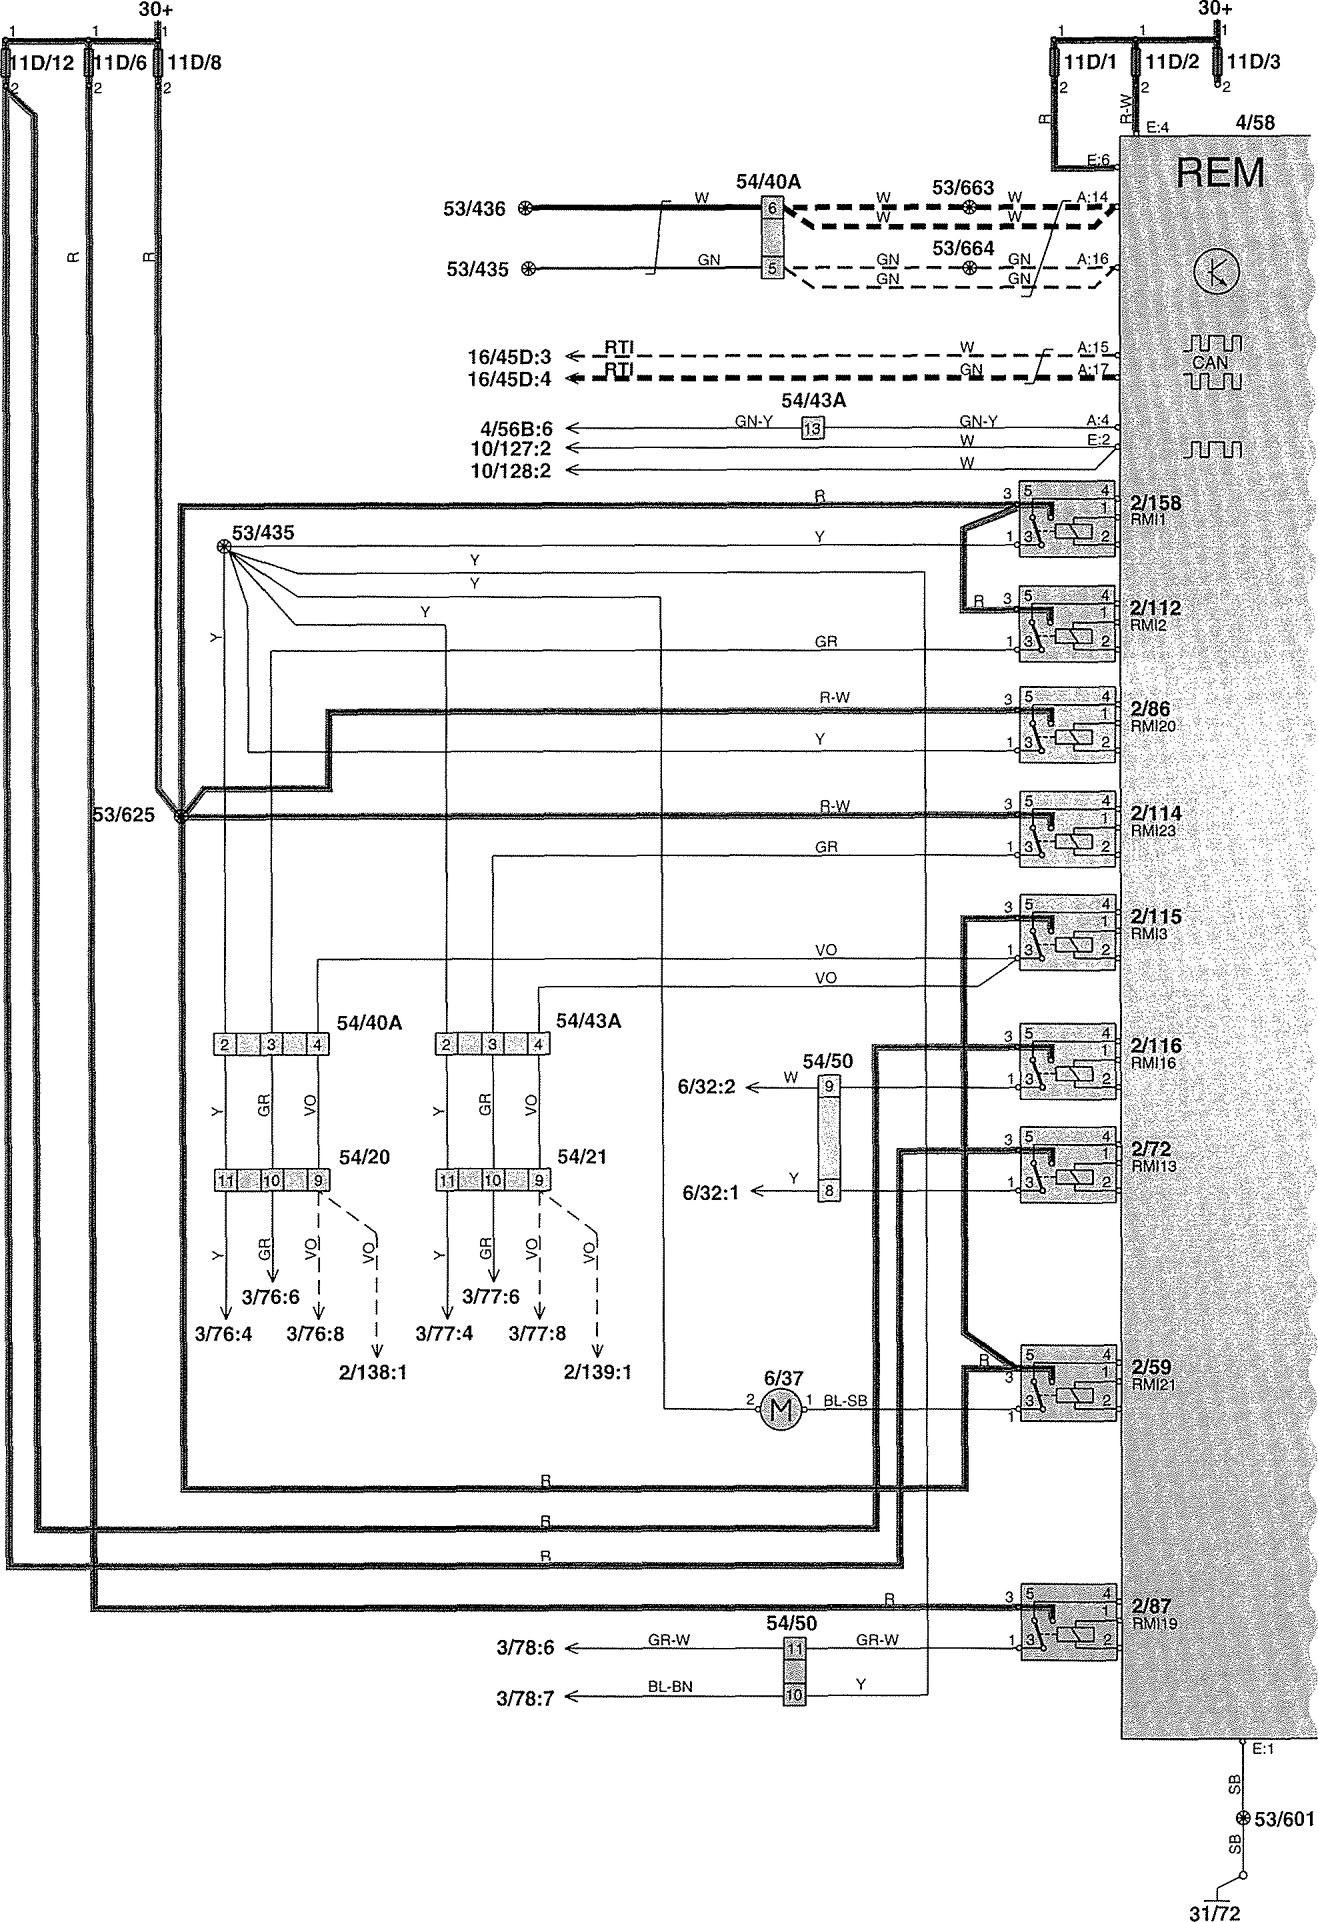 Toyota Electrical Wiring Diagram On Wiring Diagram Volvo V70 2006